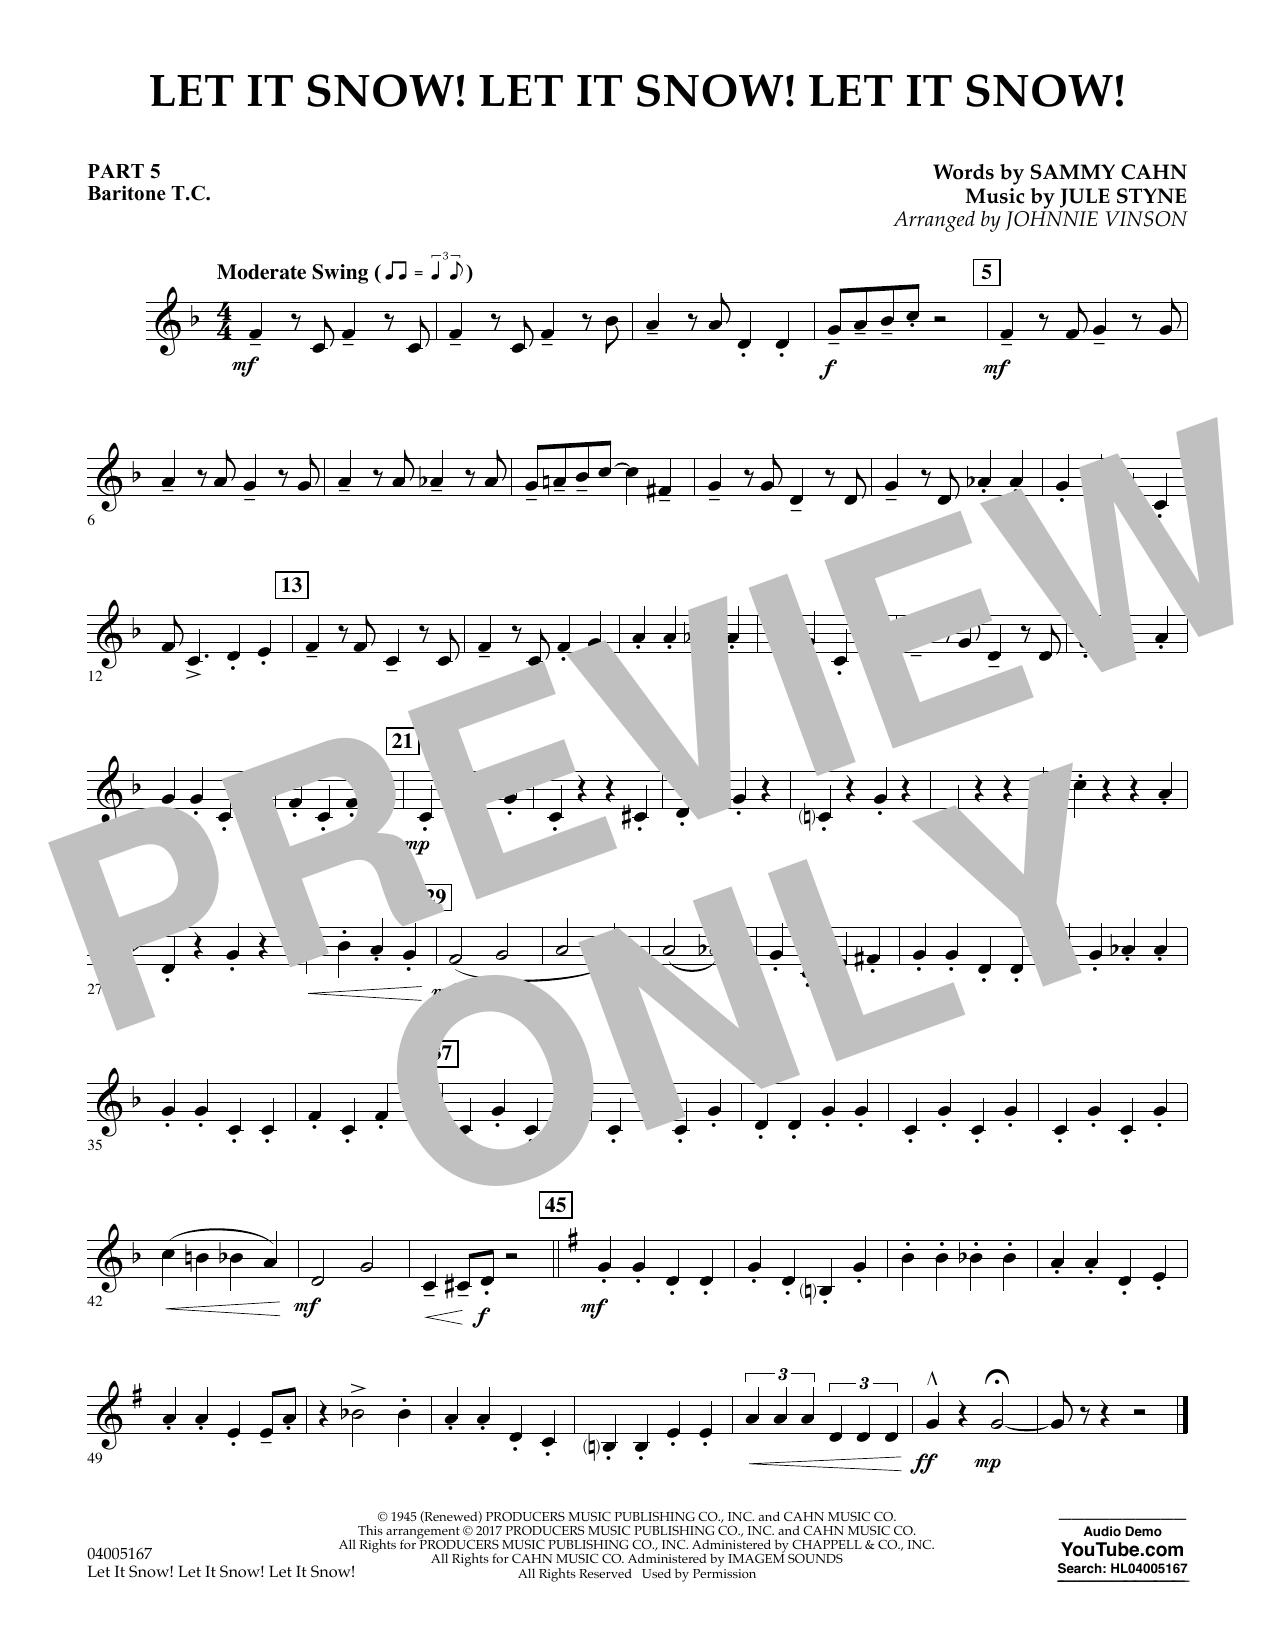 Let It Snow! Let It Snow! Let It Snow! - Pt.5 - Baritone T.C. (Concert Band)